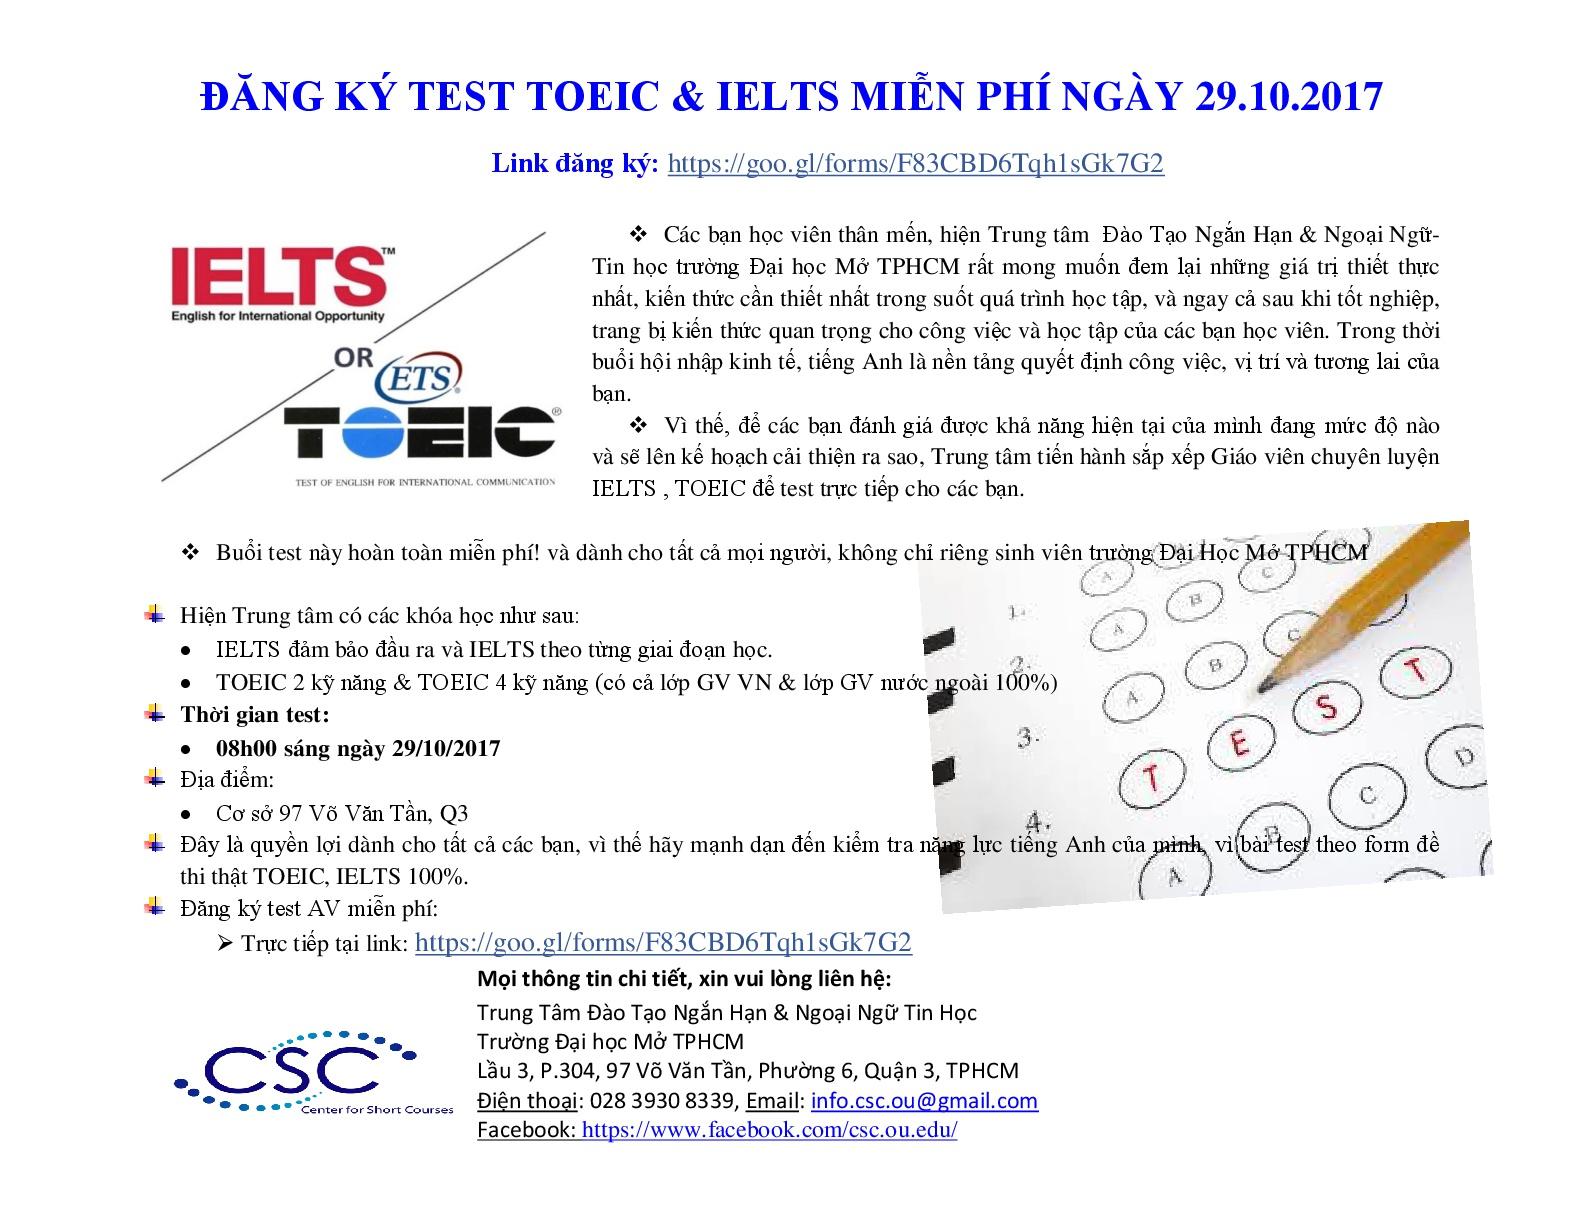 thong-tin-test-TOEIC,-IELTS-ngay-29.10.2017-001